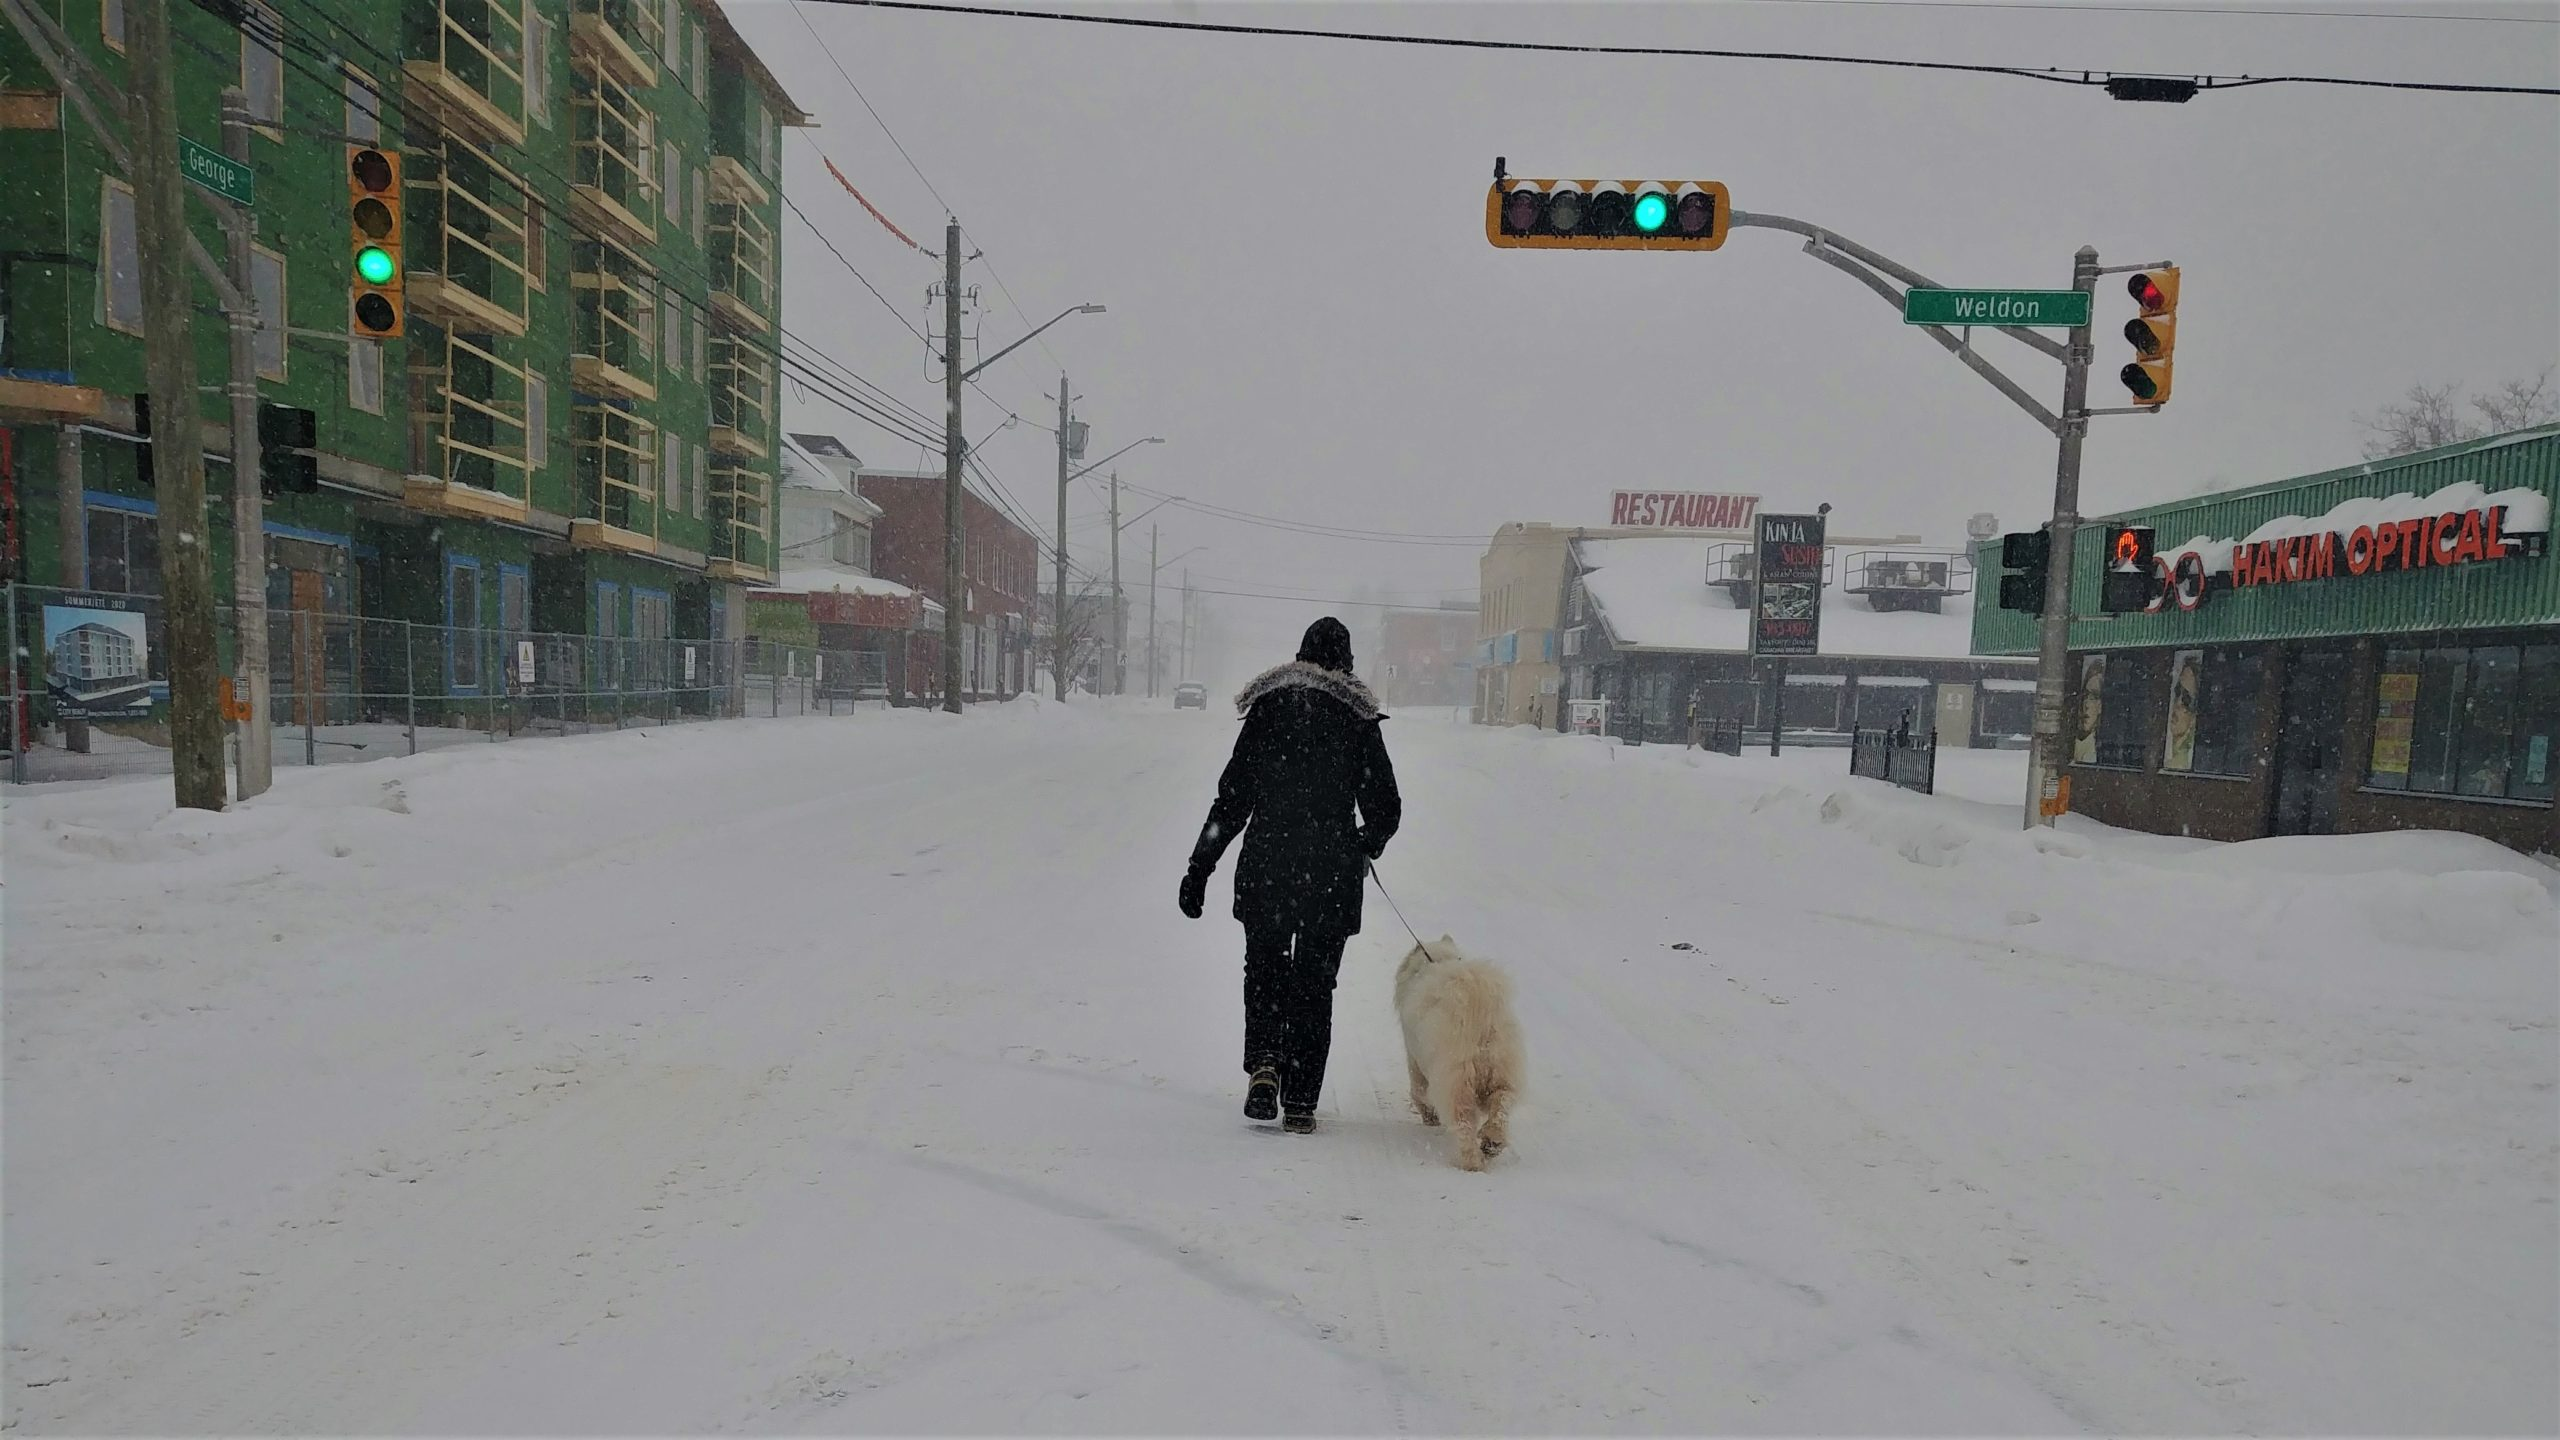 Tempête hiver canada que faire Arpenter le chemin